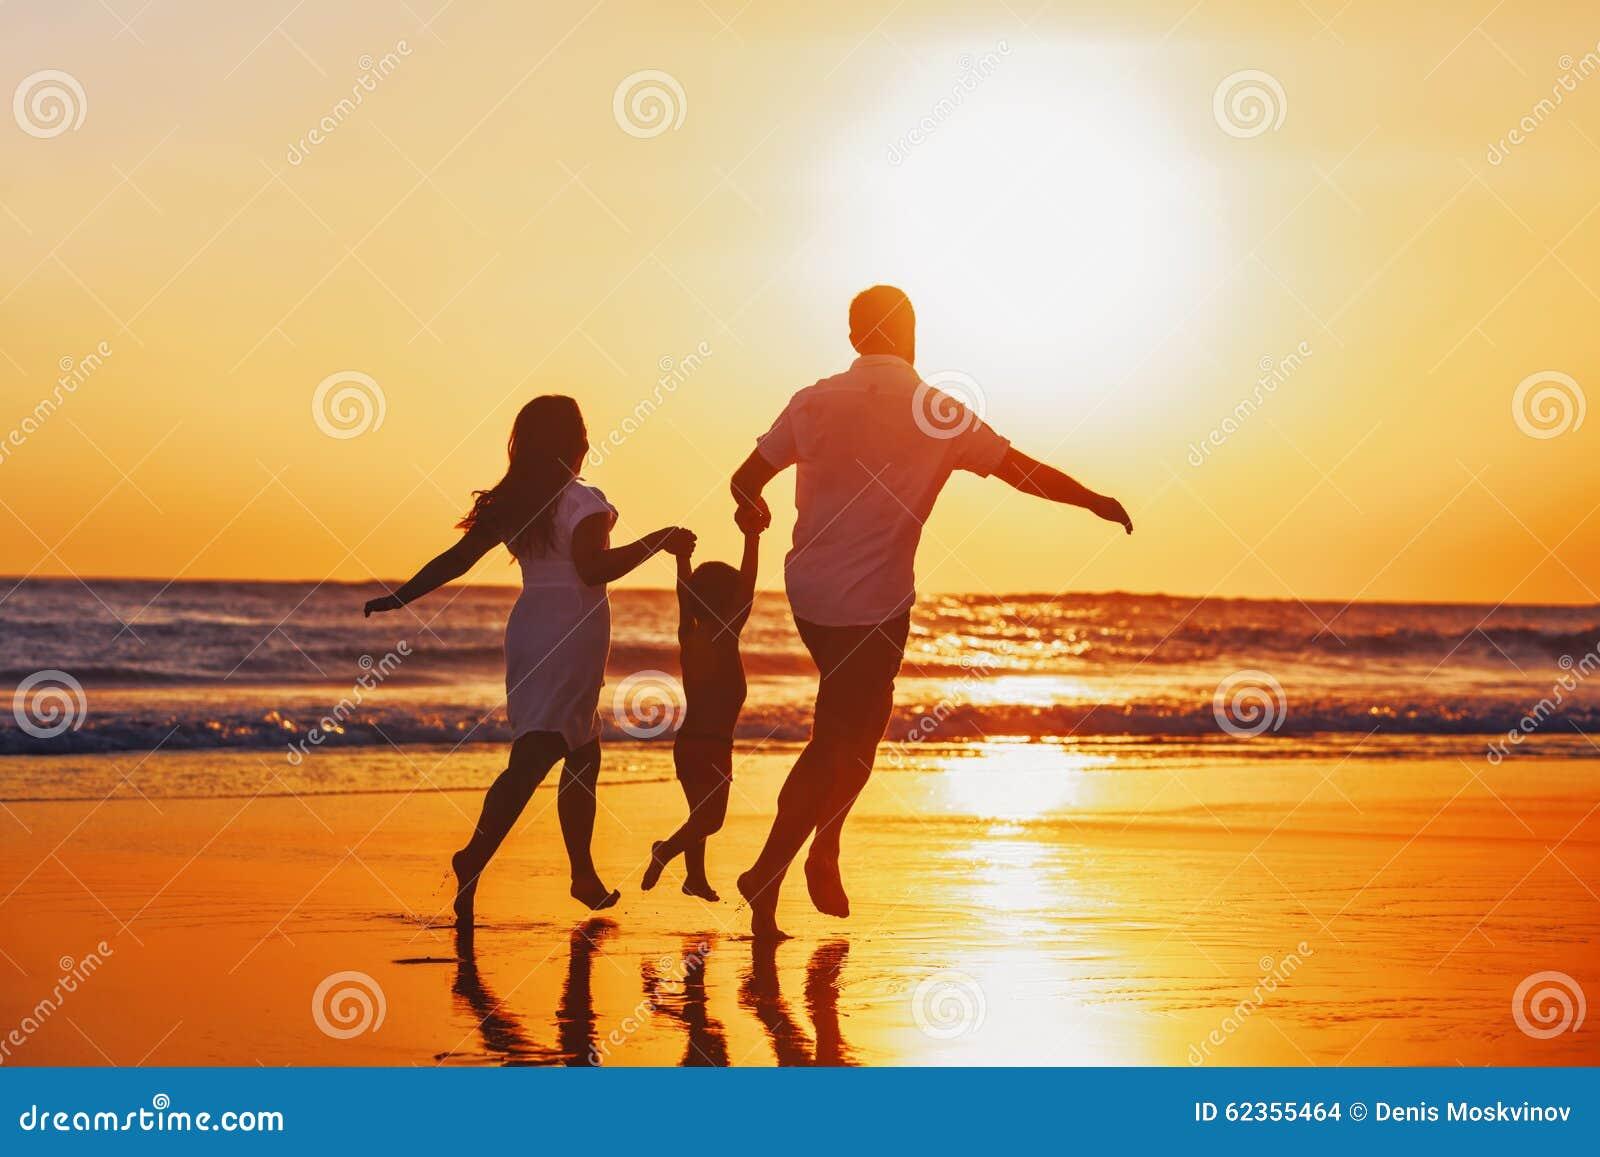 Счастливая семья с ребенком имеет потеху на пляже захода солнца